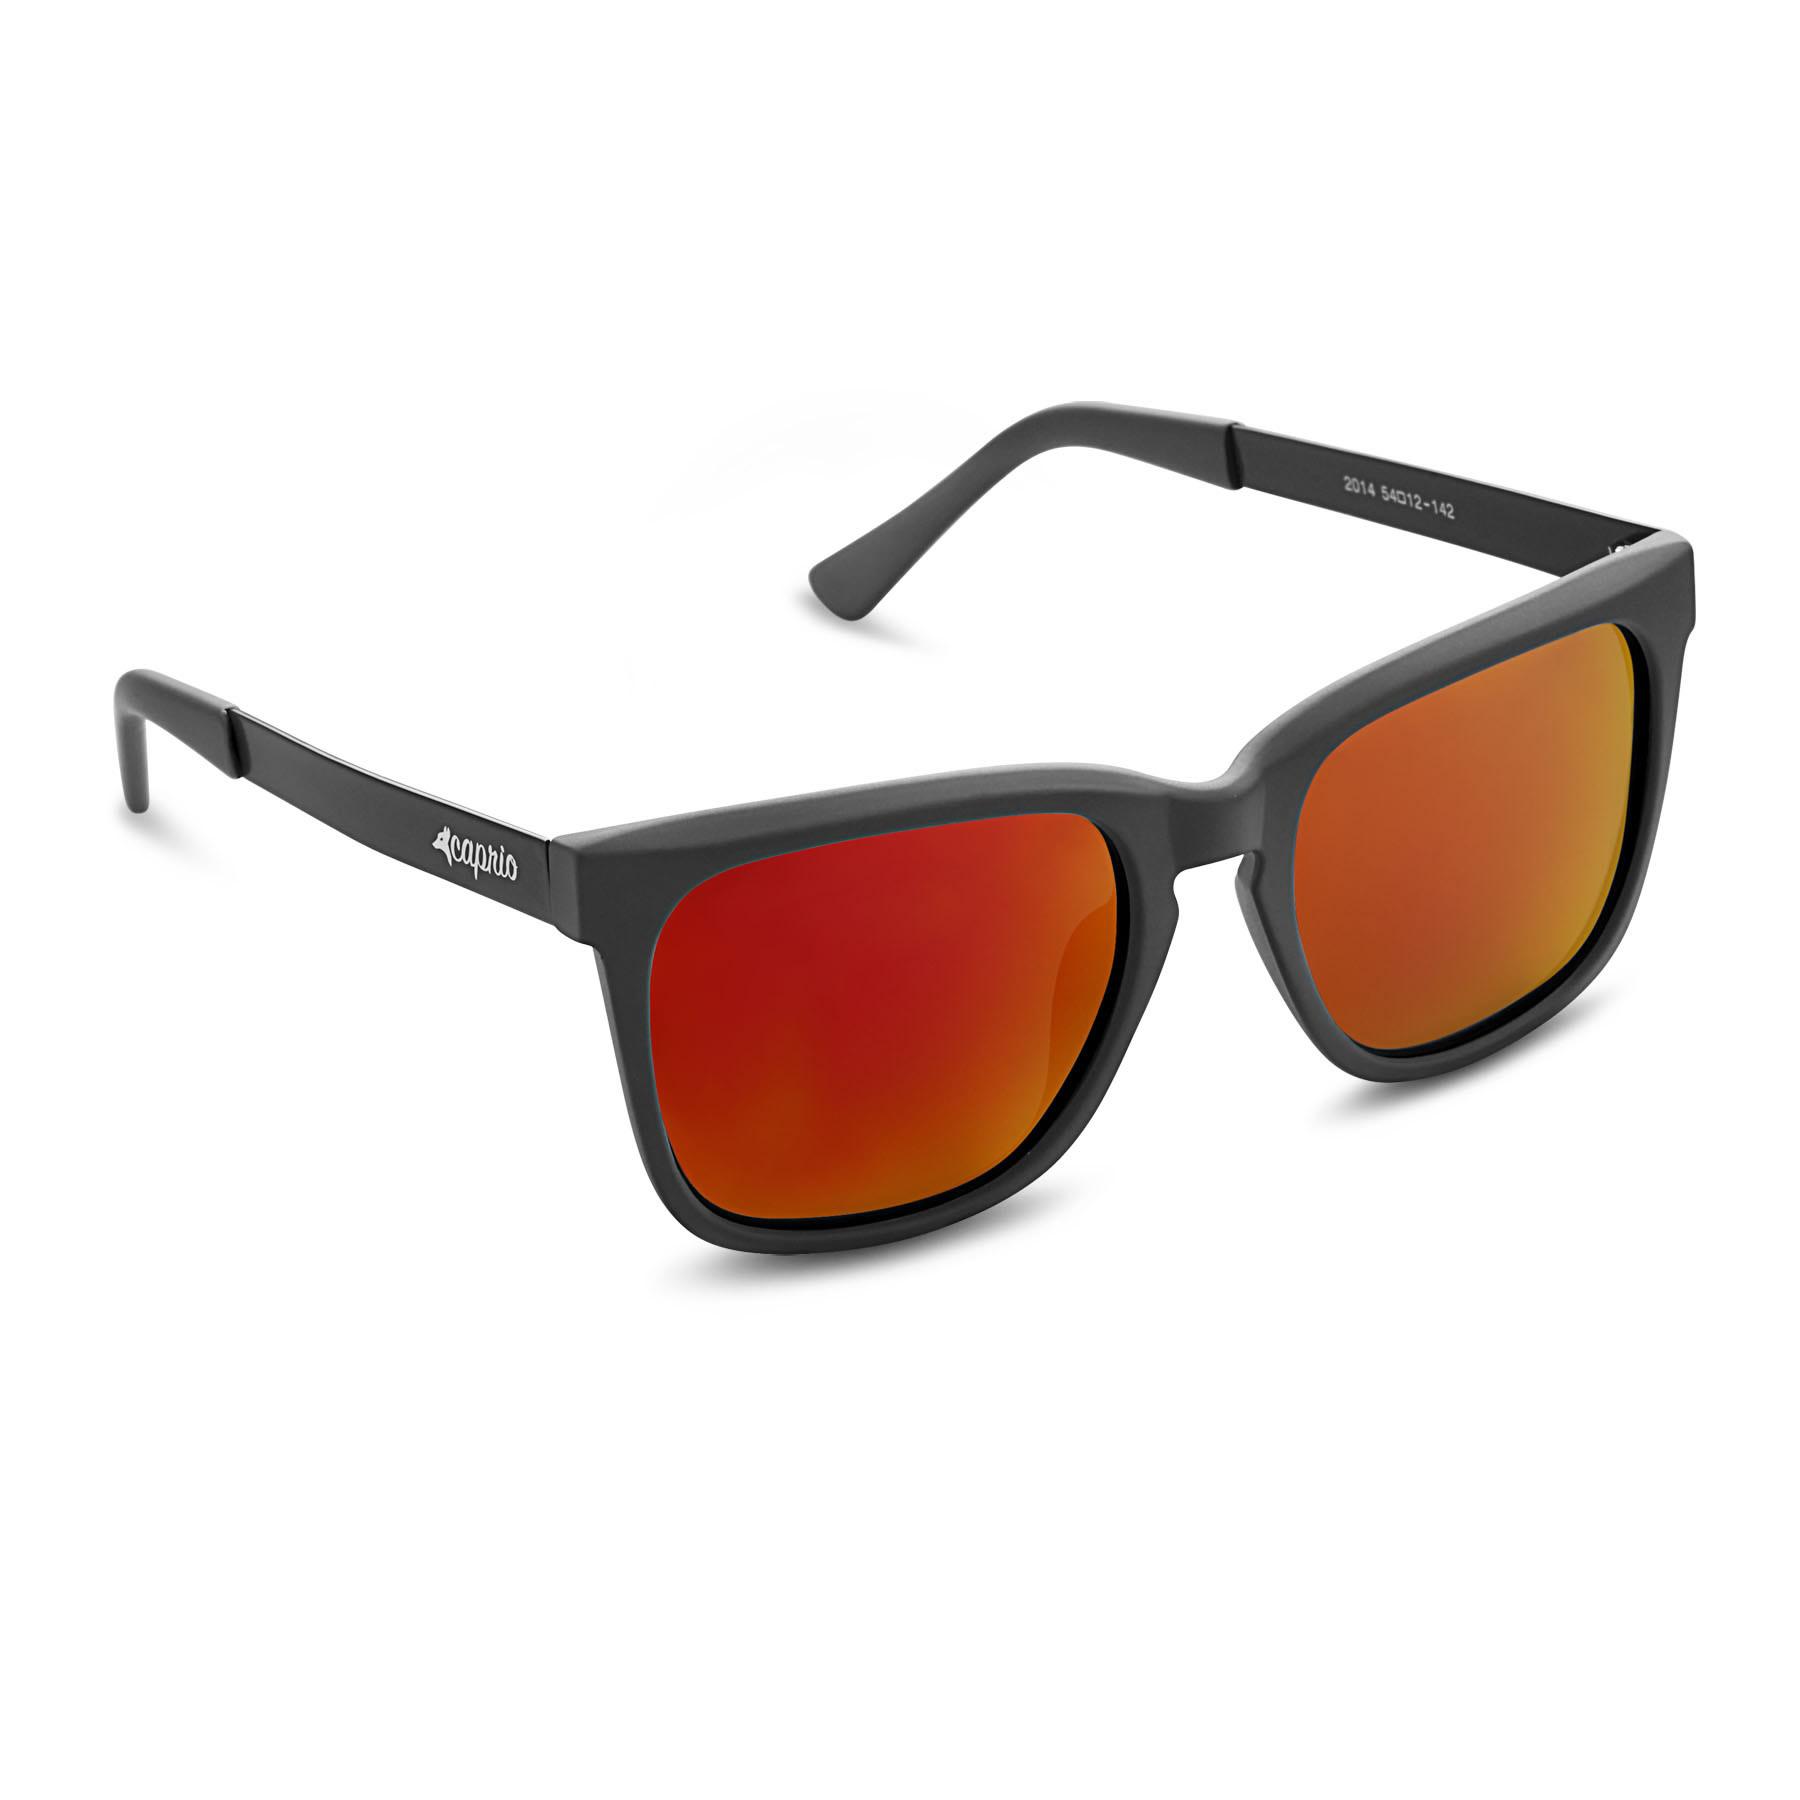 8916c8efd1a39 Caprio Unisex Mirrored Metallic Wayfarer Sunglasses